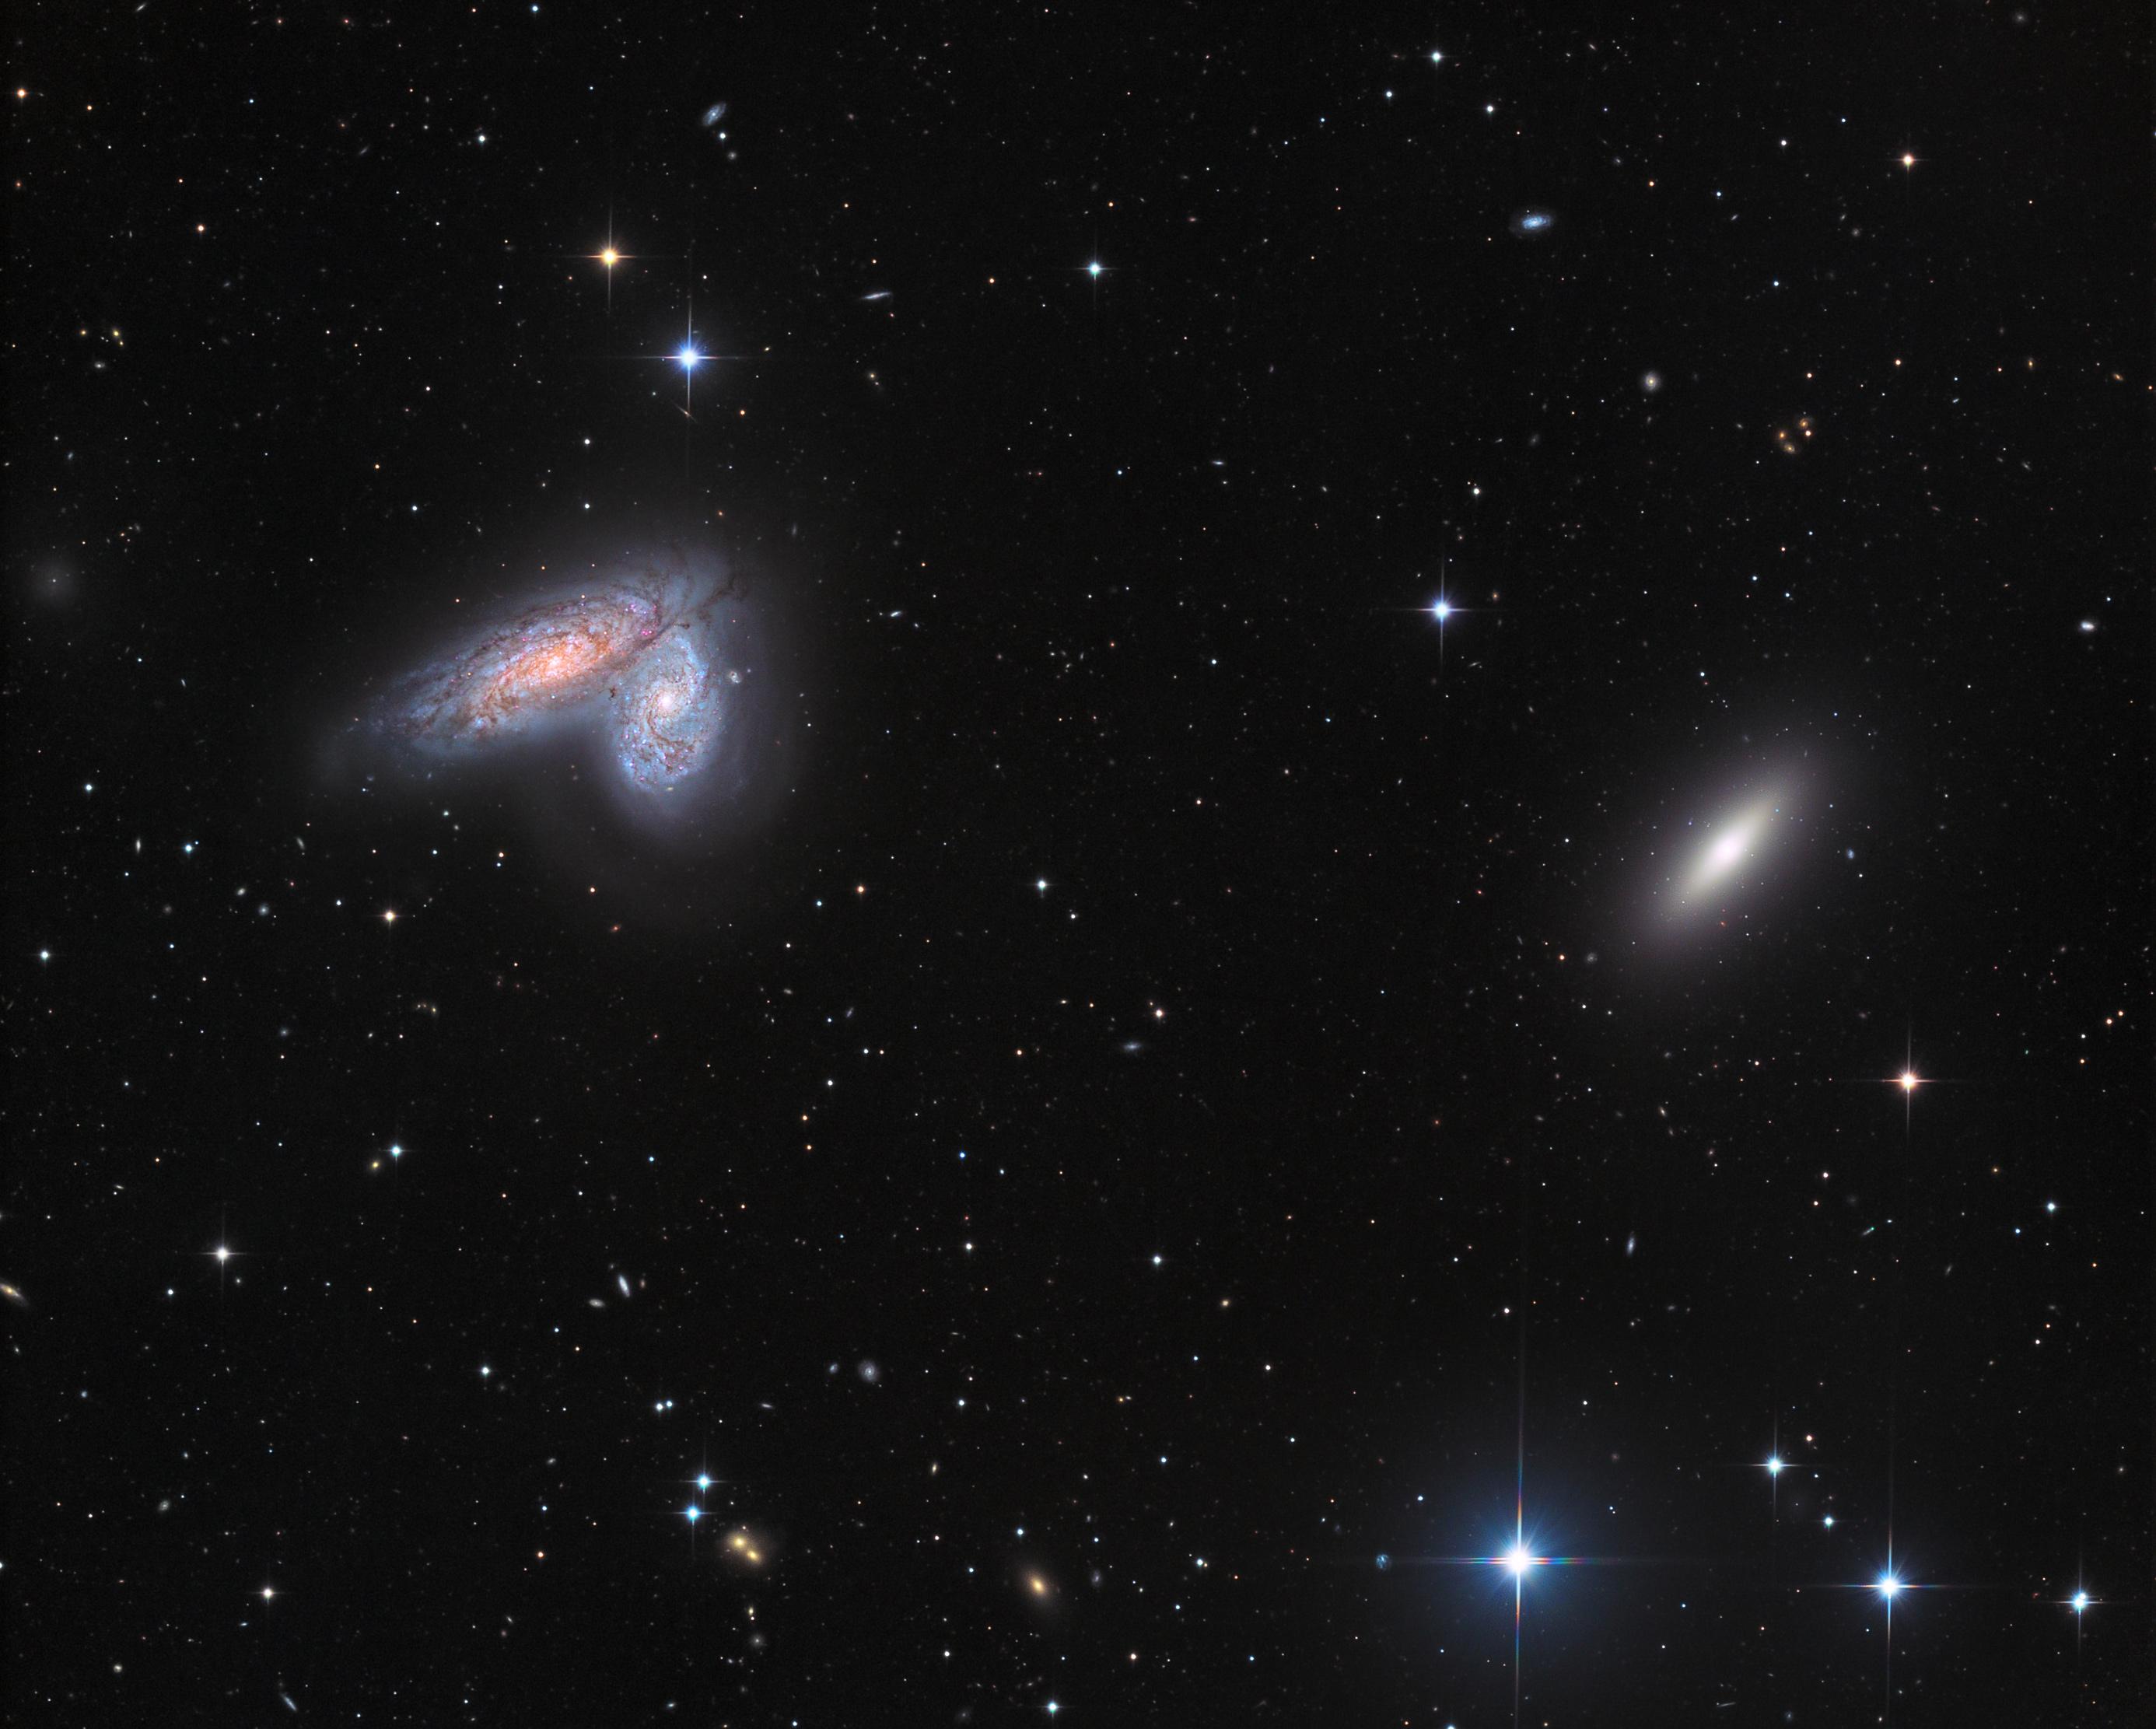 NGC4567_70chart32.jpg